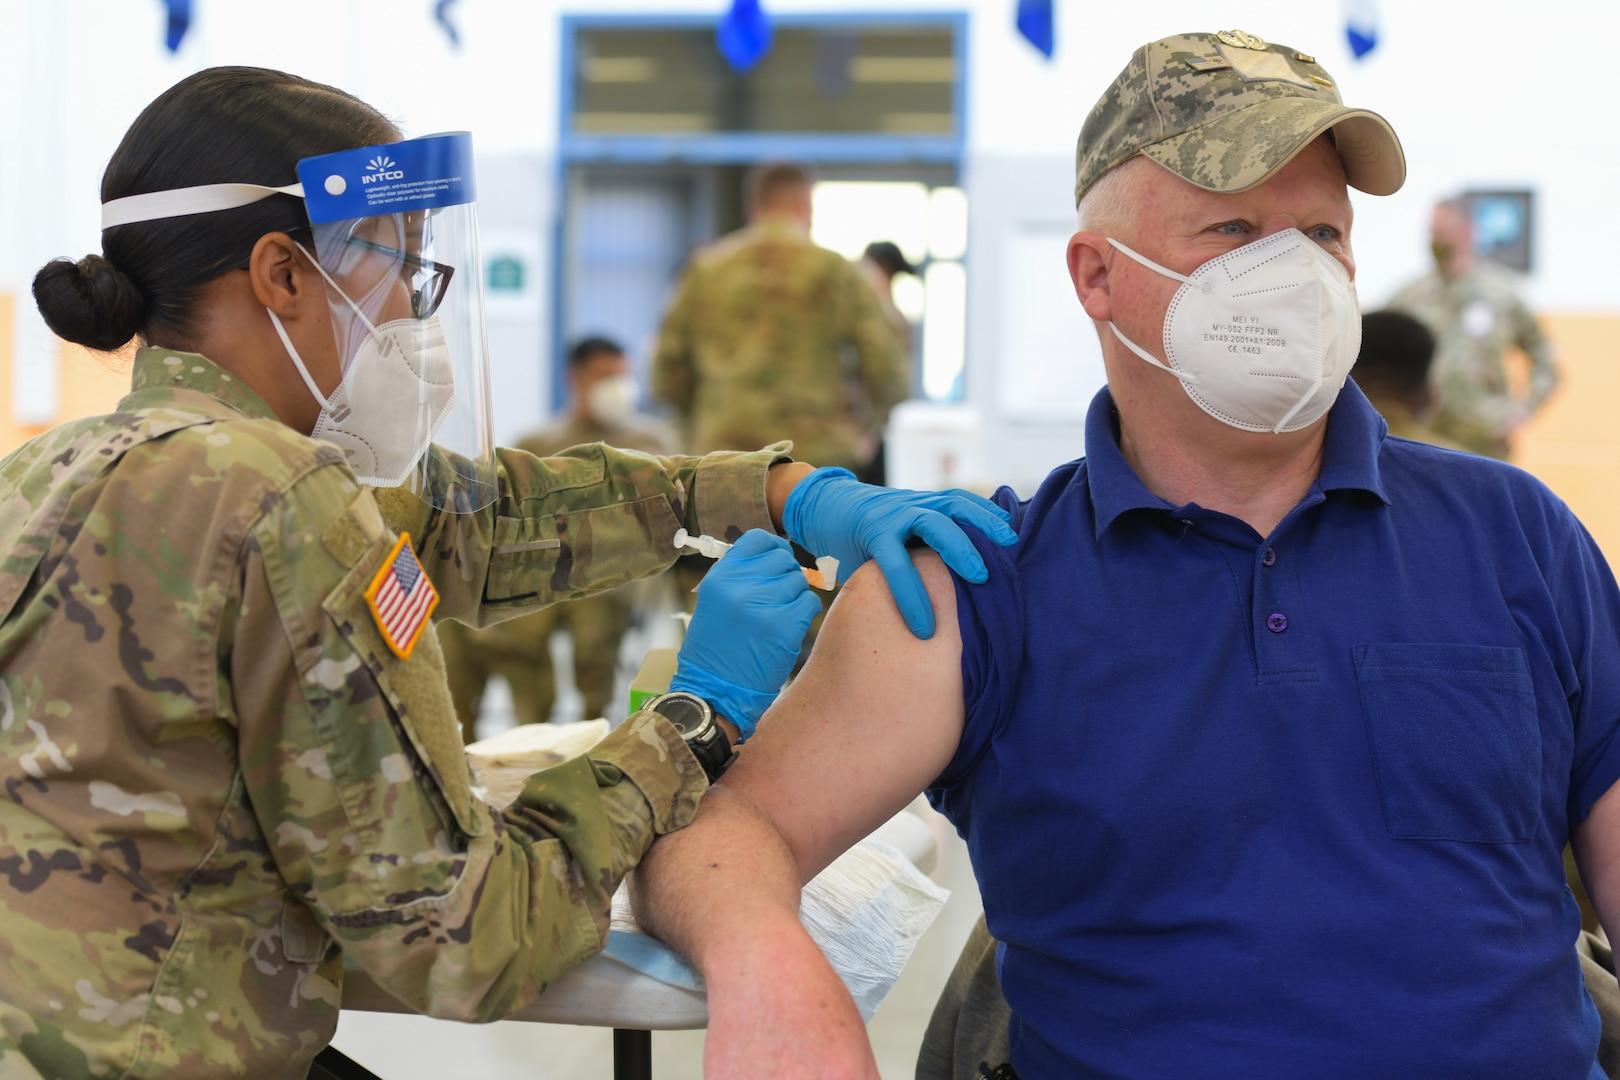 Service member administers COVID-19 vaccine